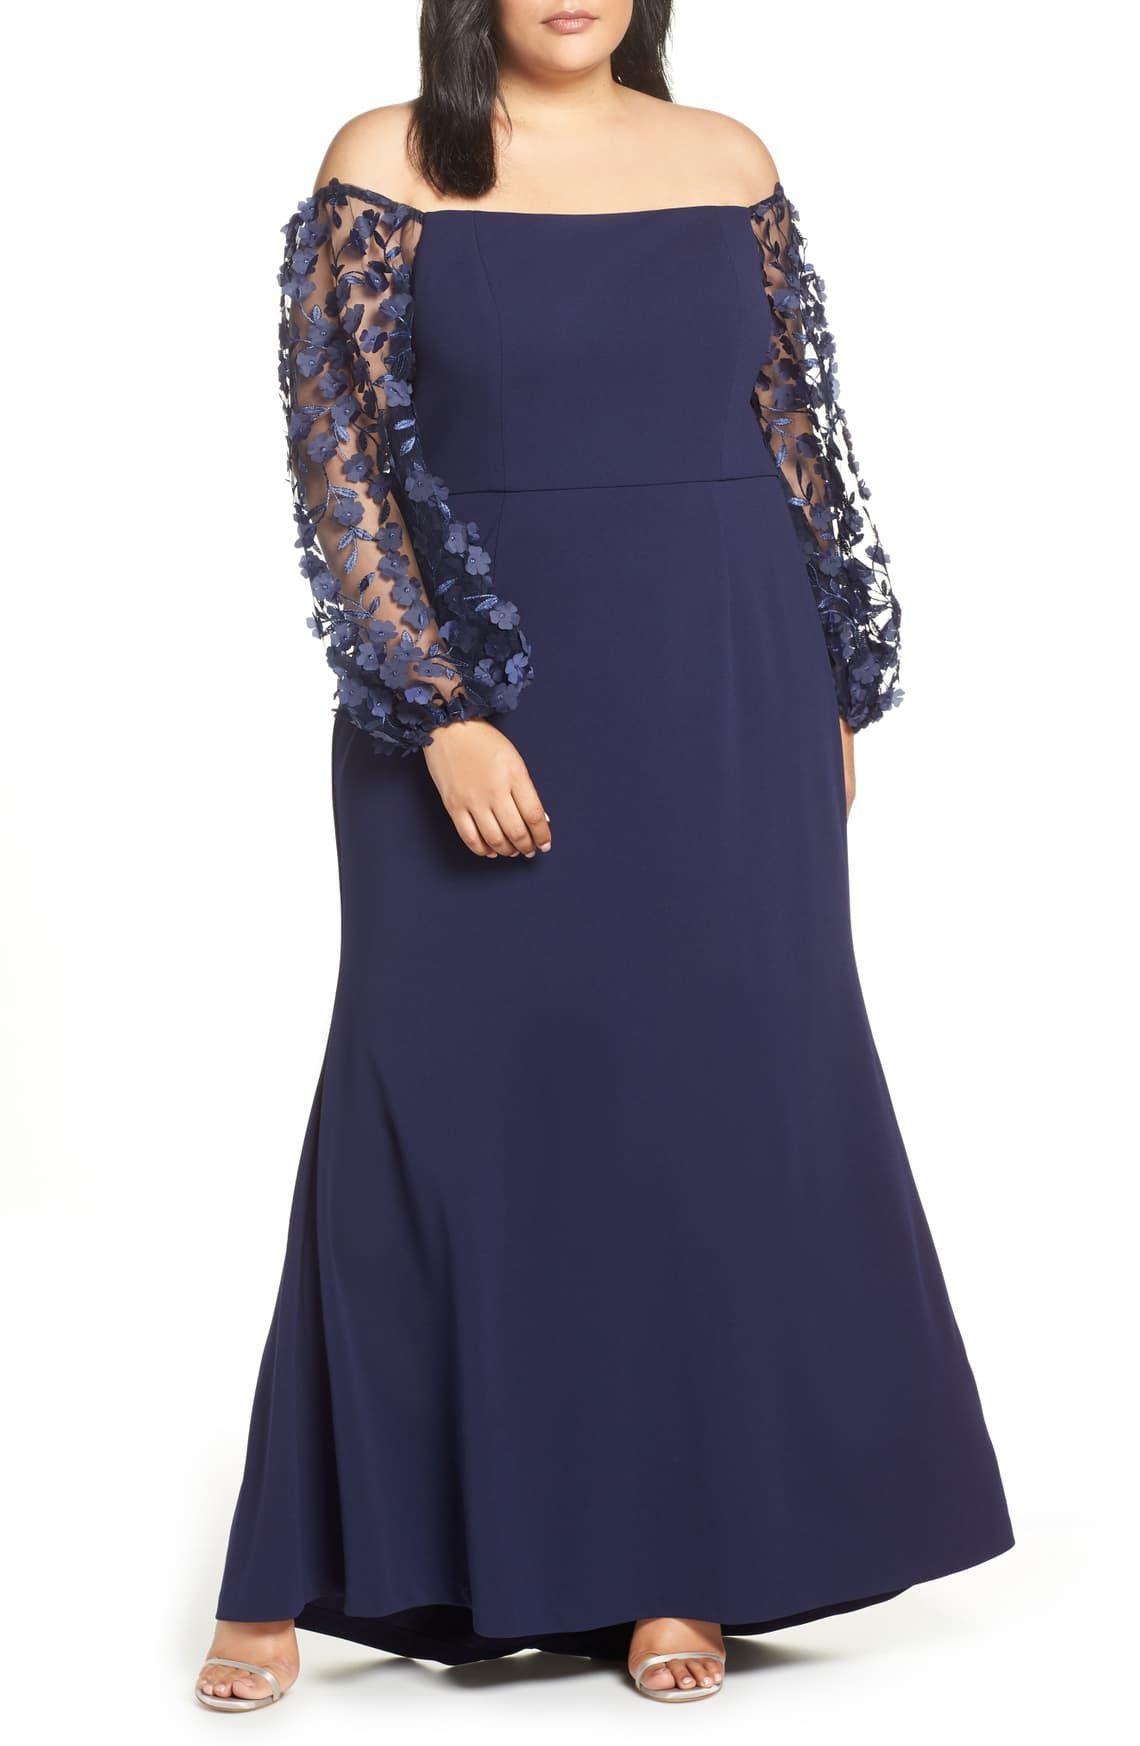 Eliza J Off The Shoulder 3d Floral Sleeve Scuba Crepe Evening Dress Plus Size Nordstrom Evening Dresses Plus Size Plus Size Formal Dresses Plus Size Dresses [ 1746 x 1140 Pixel ]